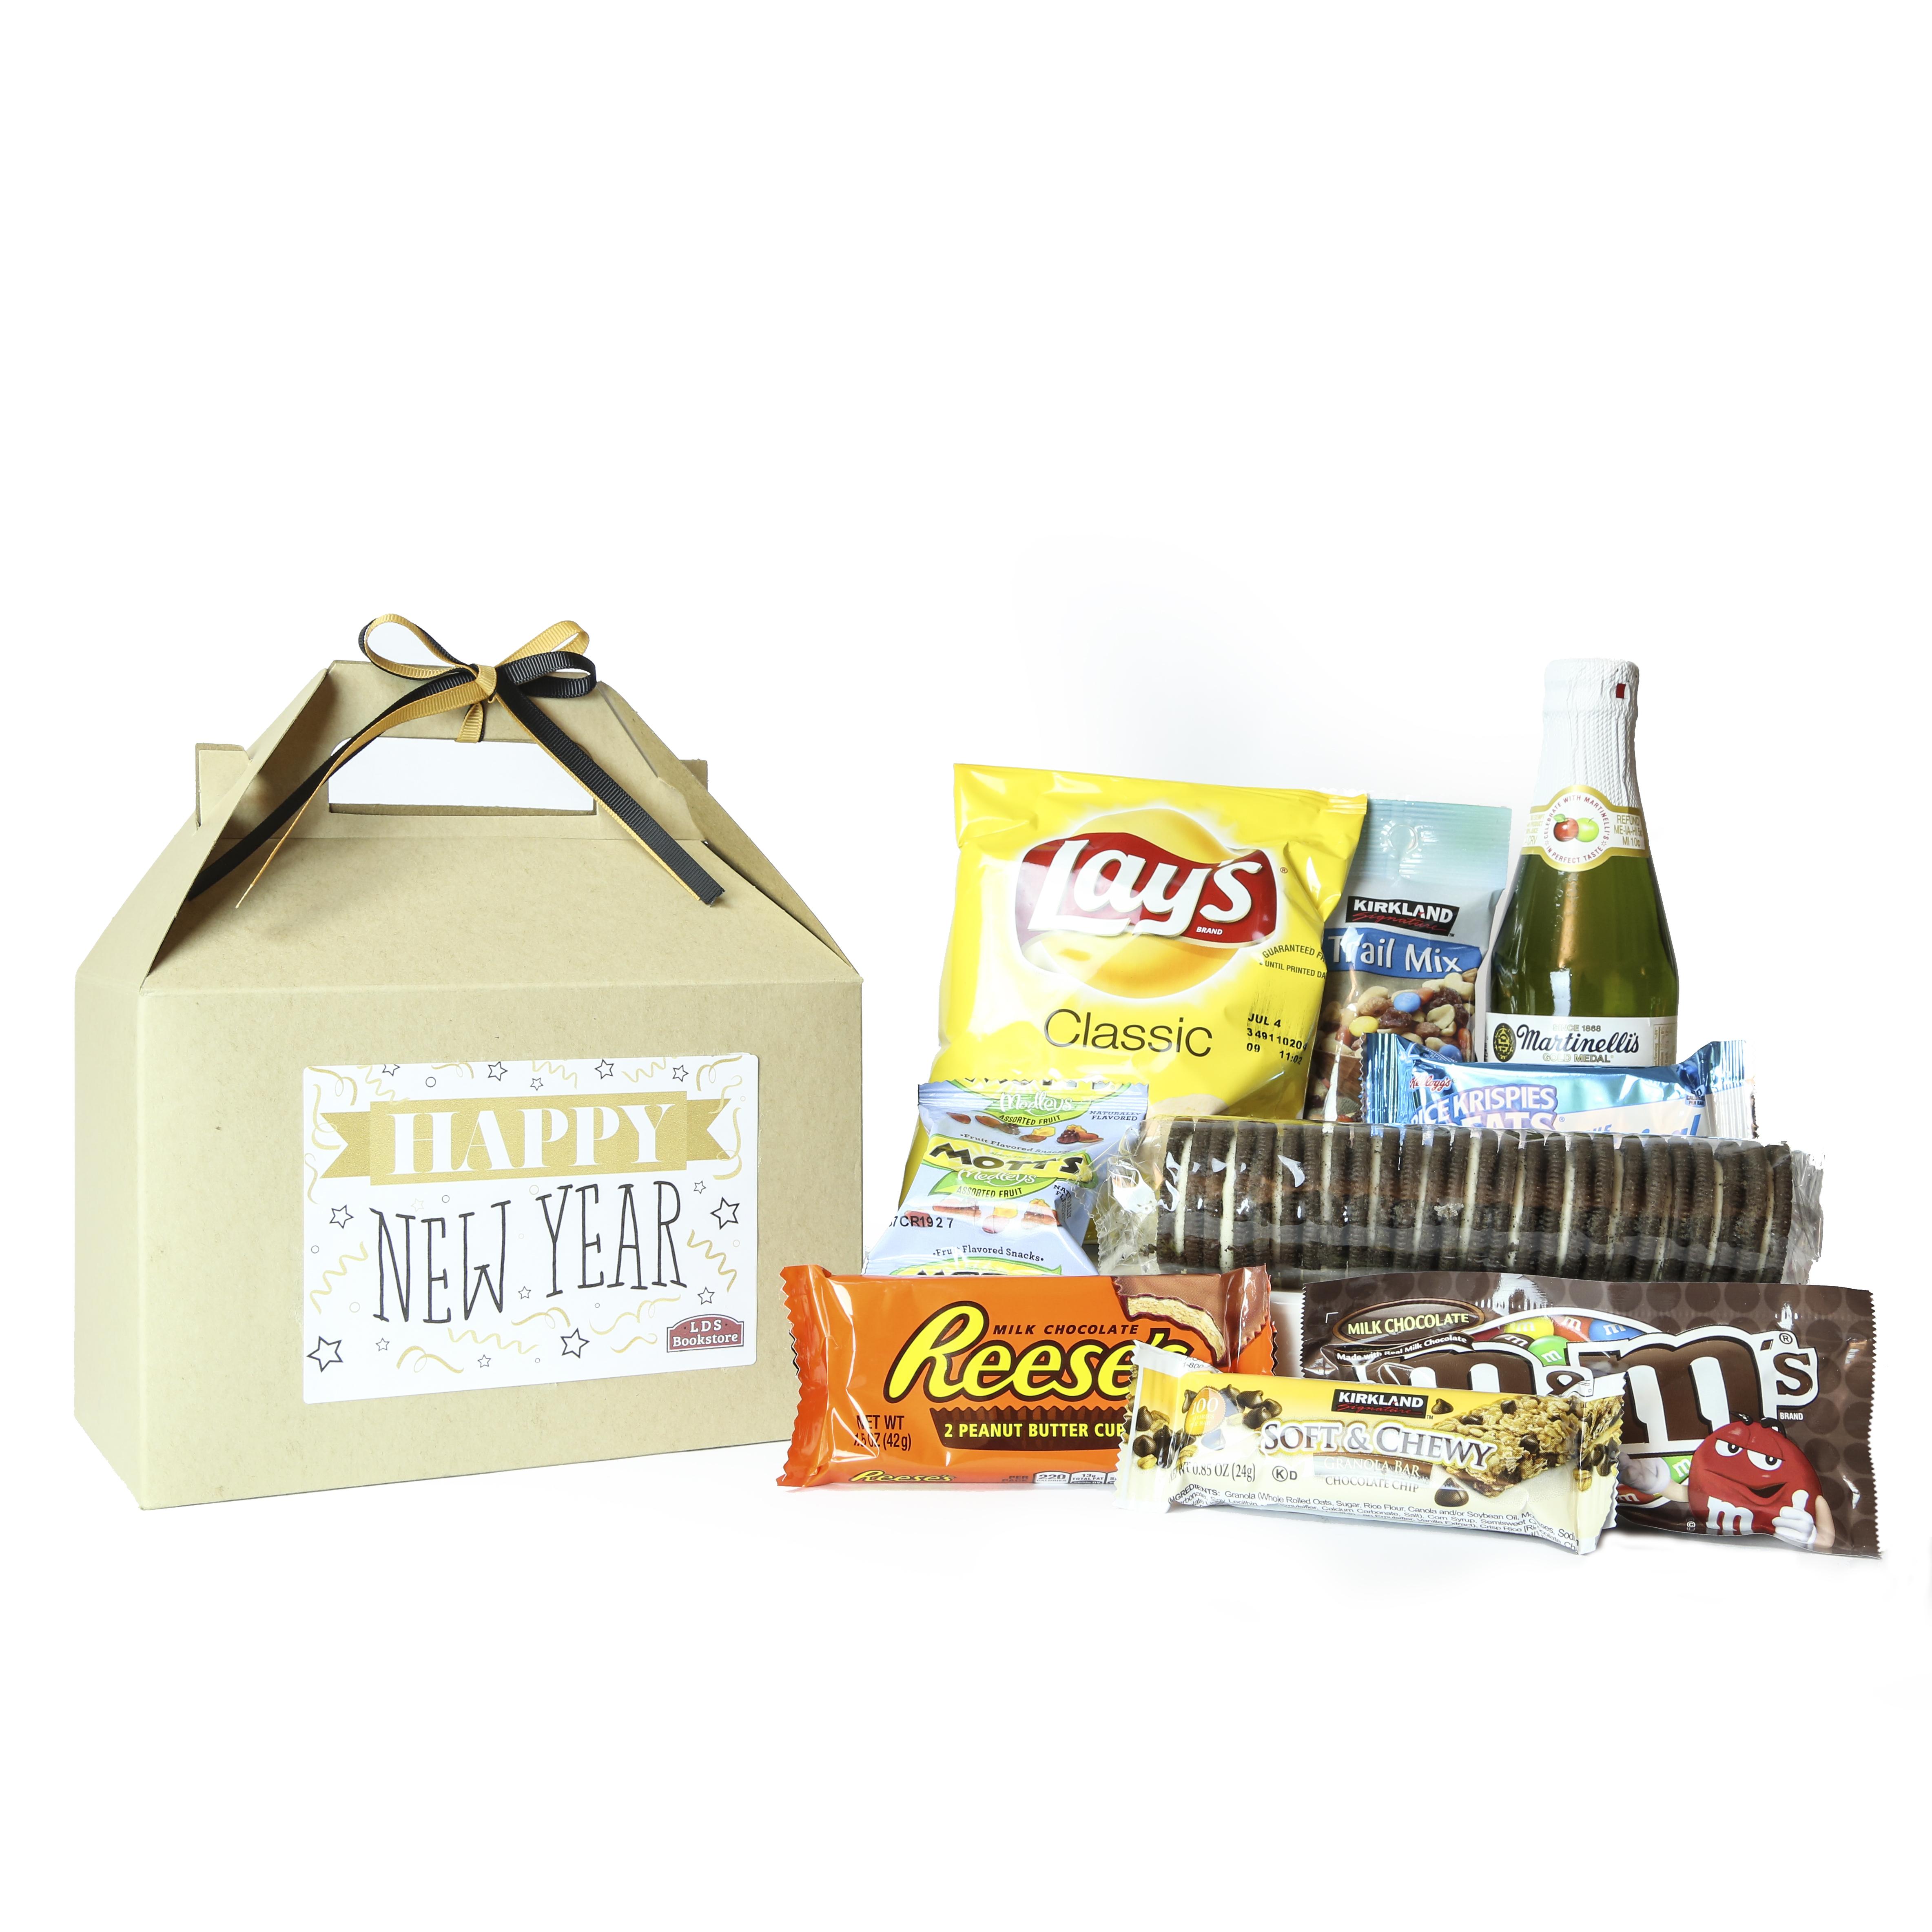 New Year's Eve/Day Gift Box - LDP-MGB147